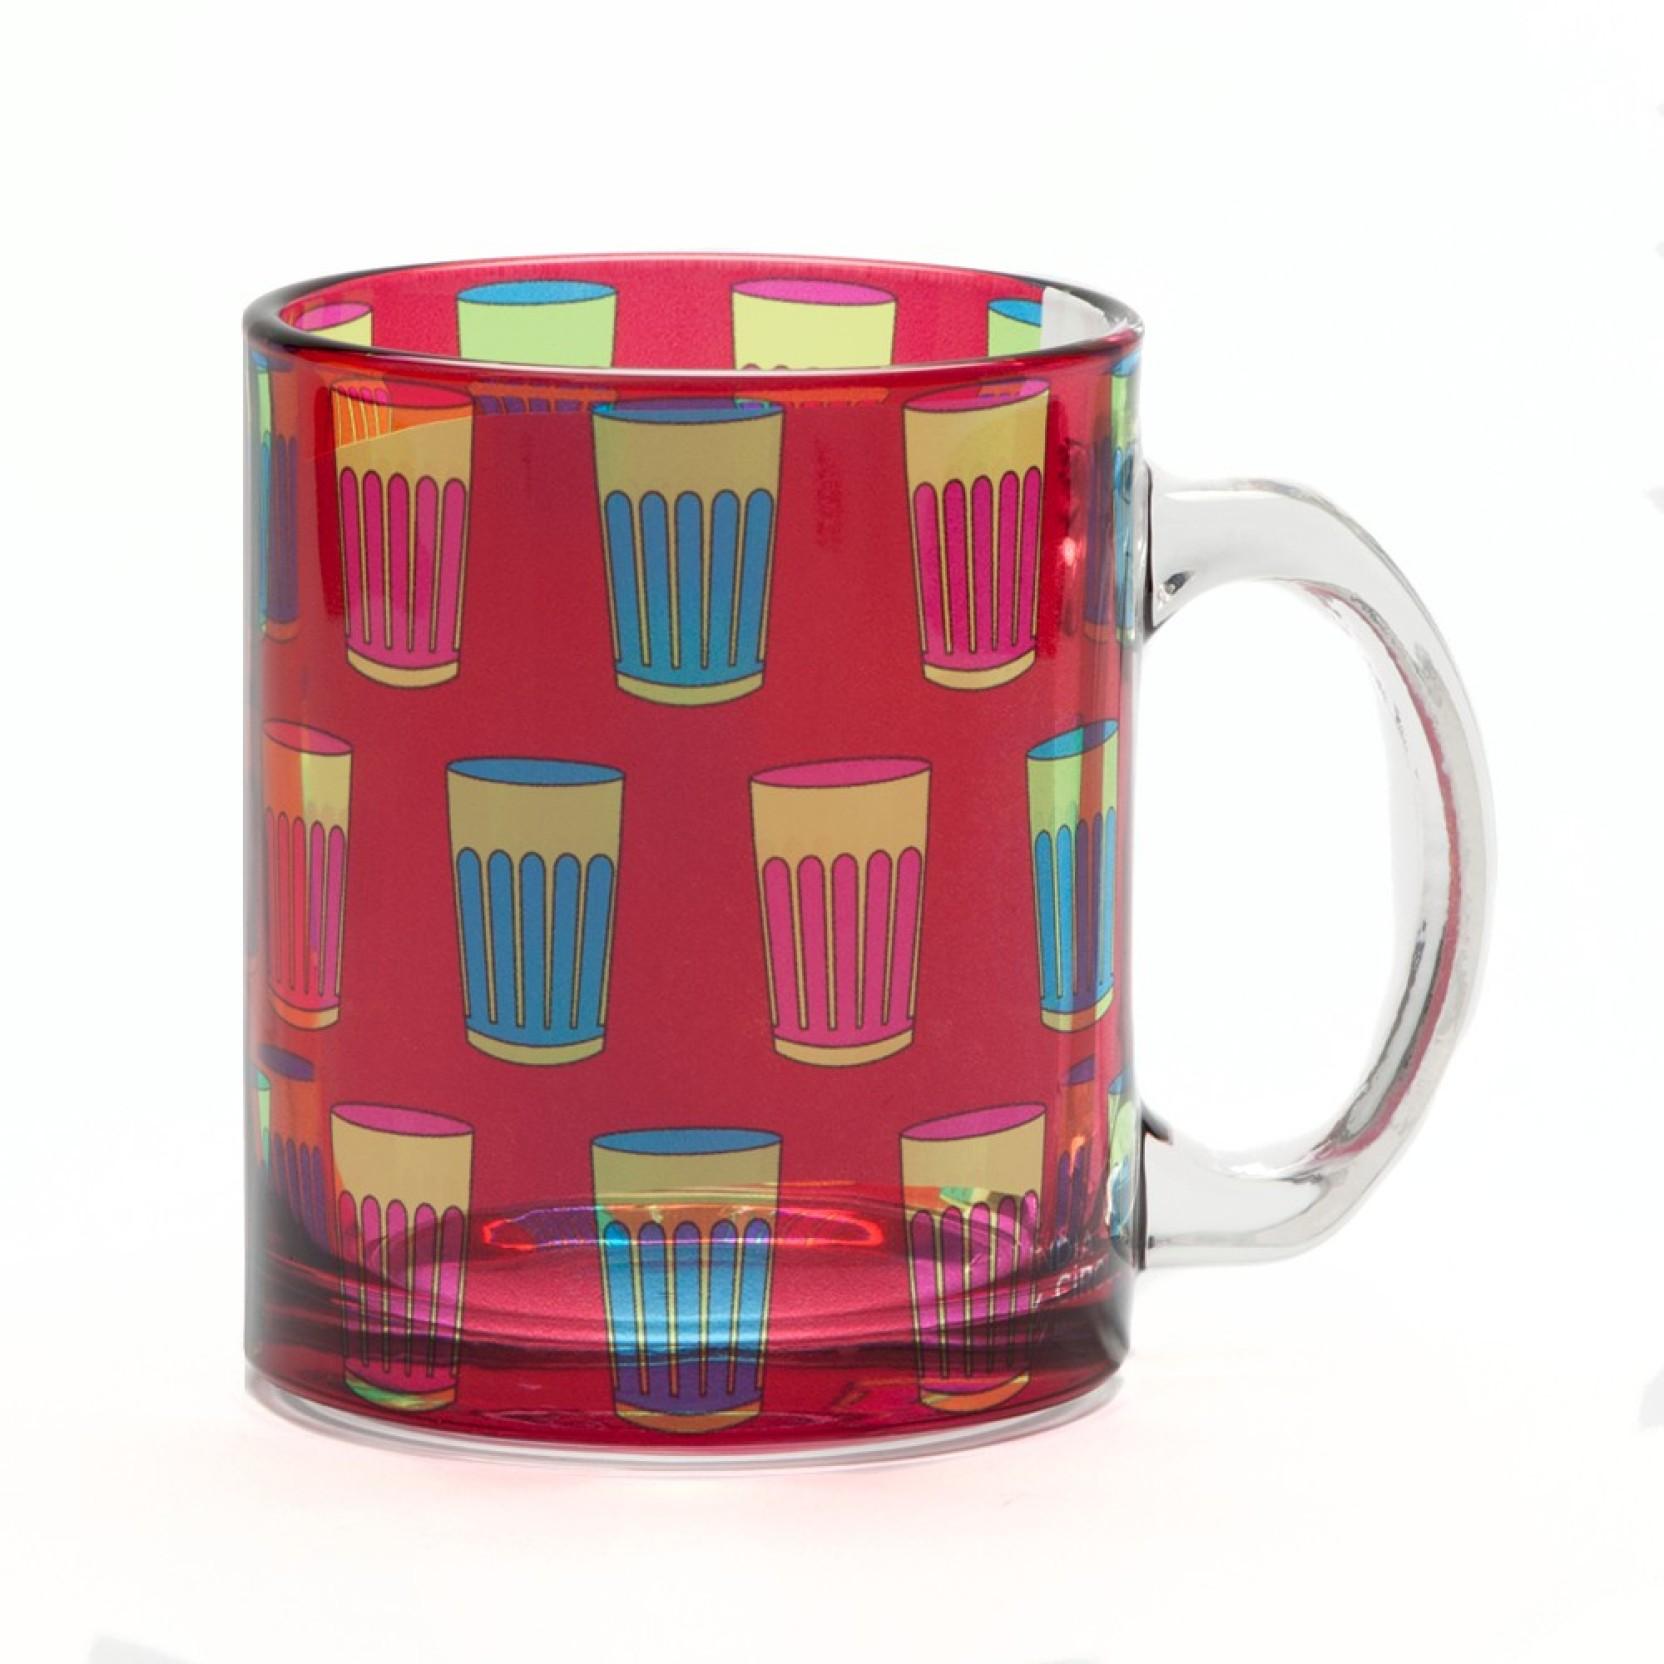 india circus cutting chai glass glass mug price in india buy india circus cutting chai glass. Black Bedroom Furniture Sets. Home Design Ideas